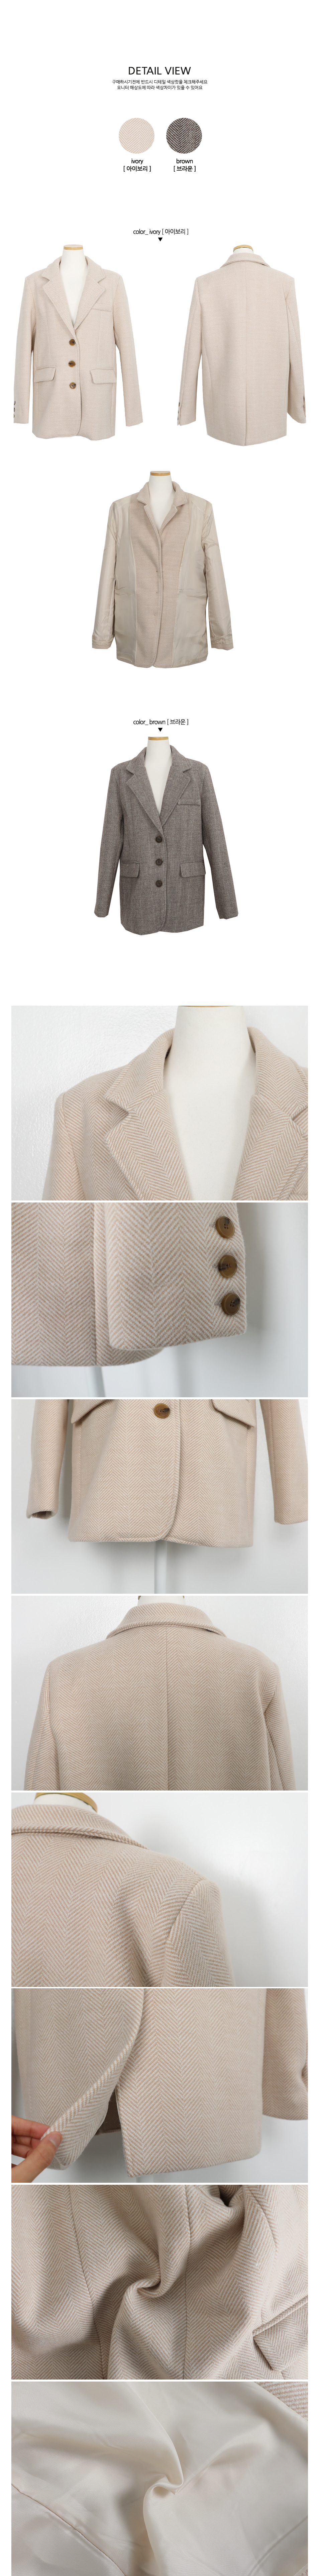 LA Bowl Herringbone Jacket